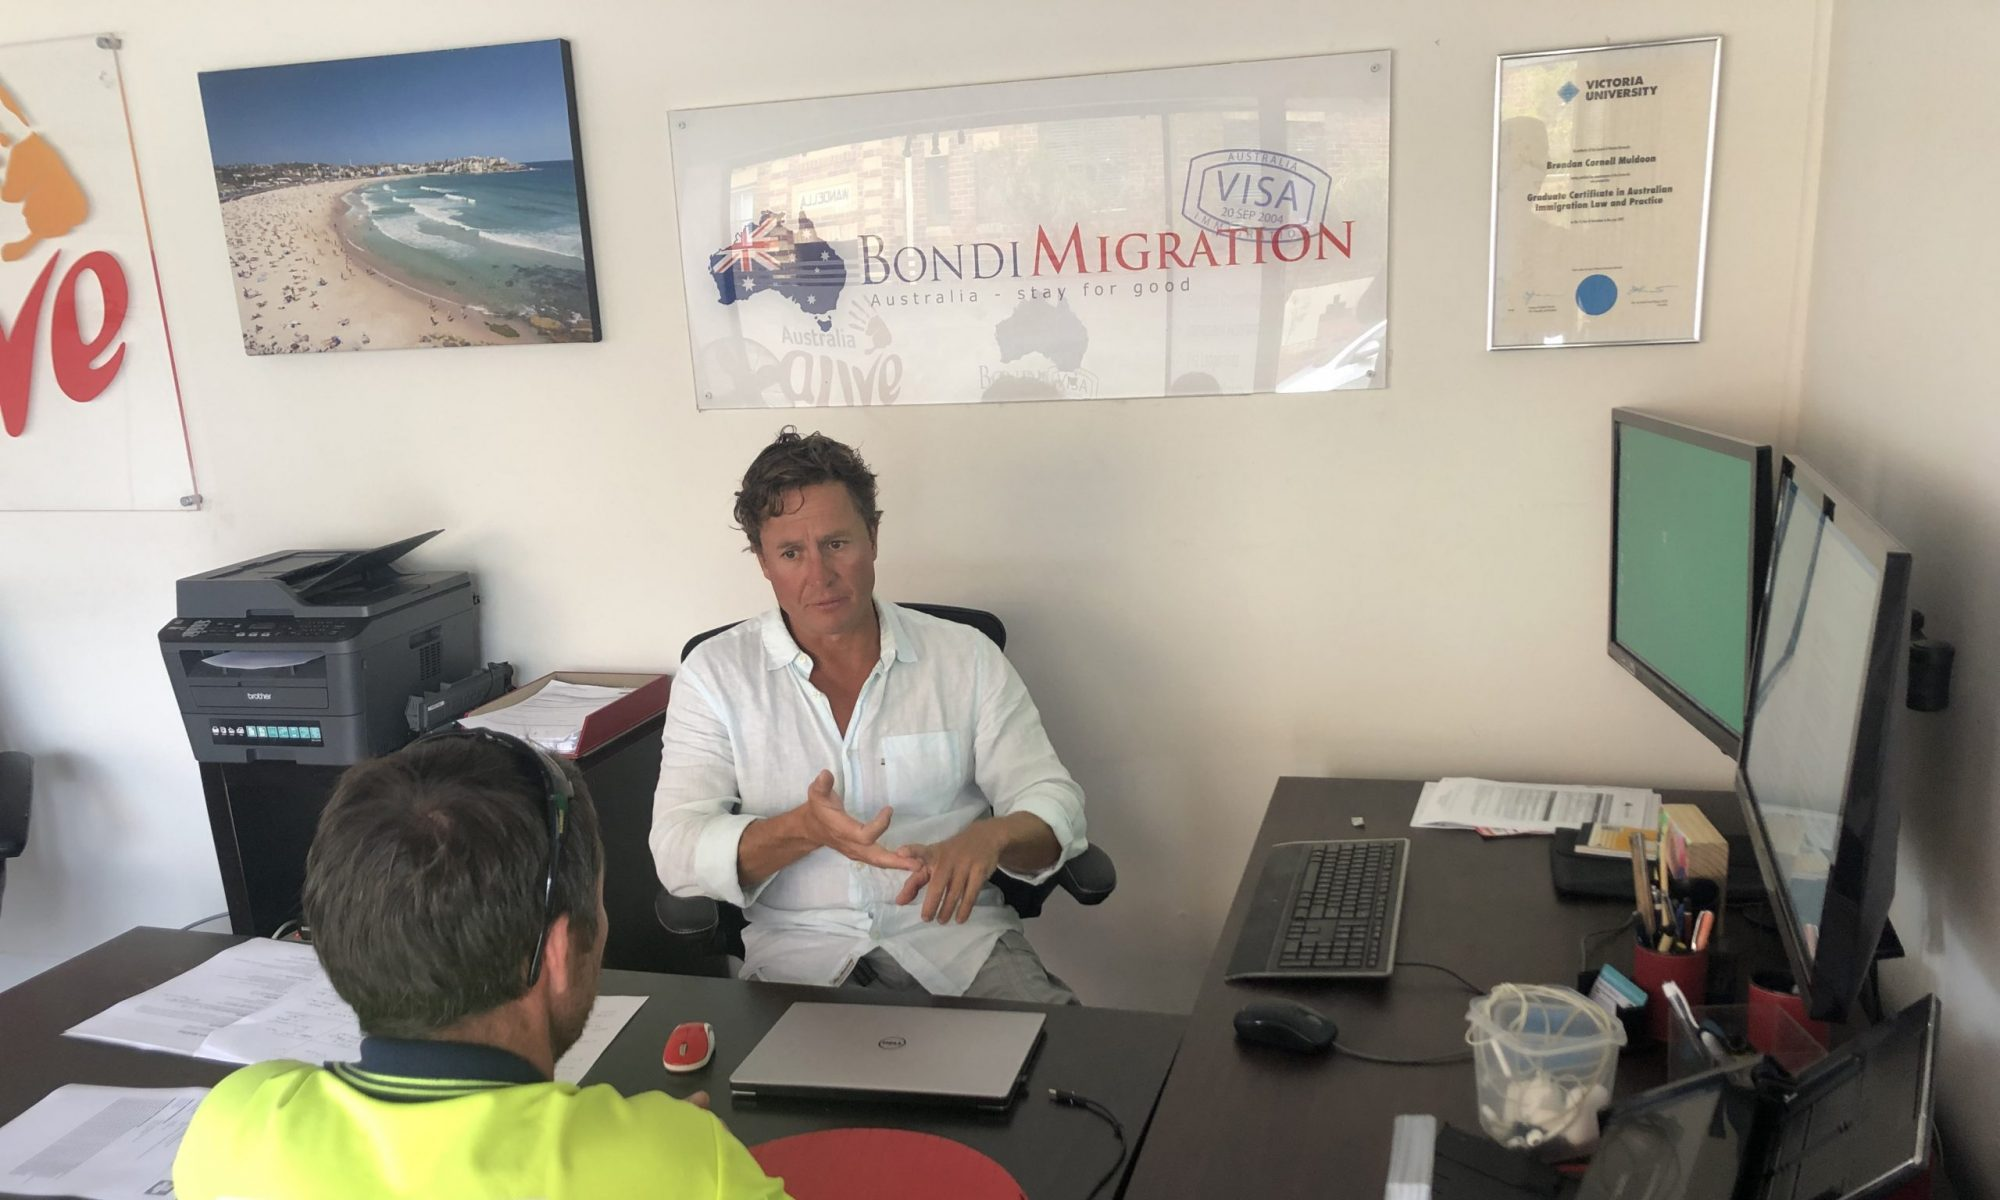 Bondi Migration